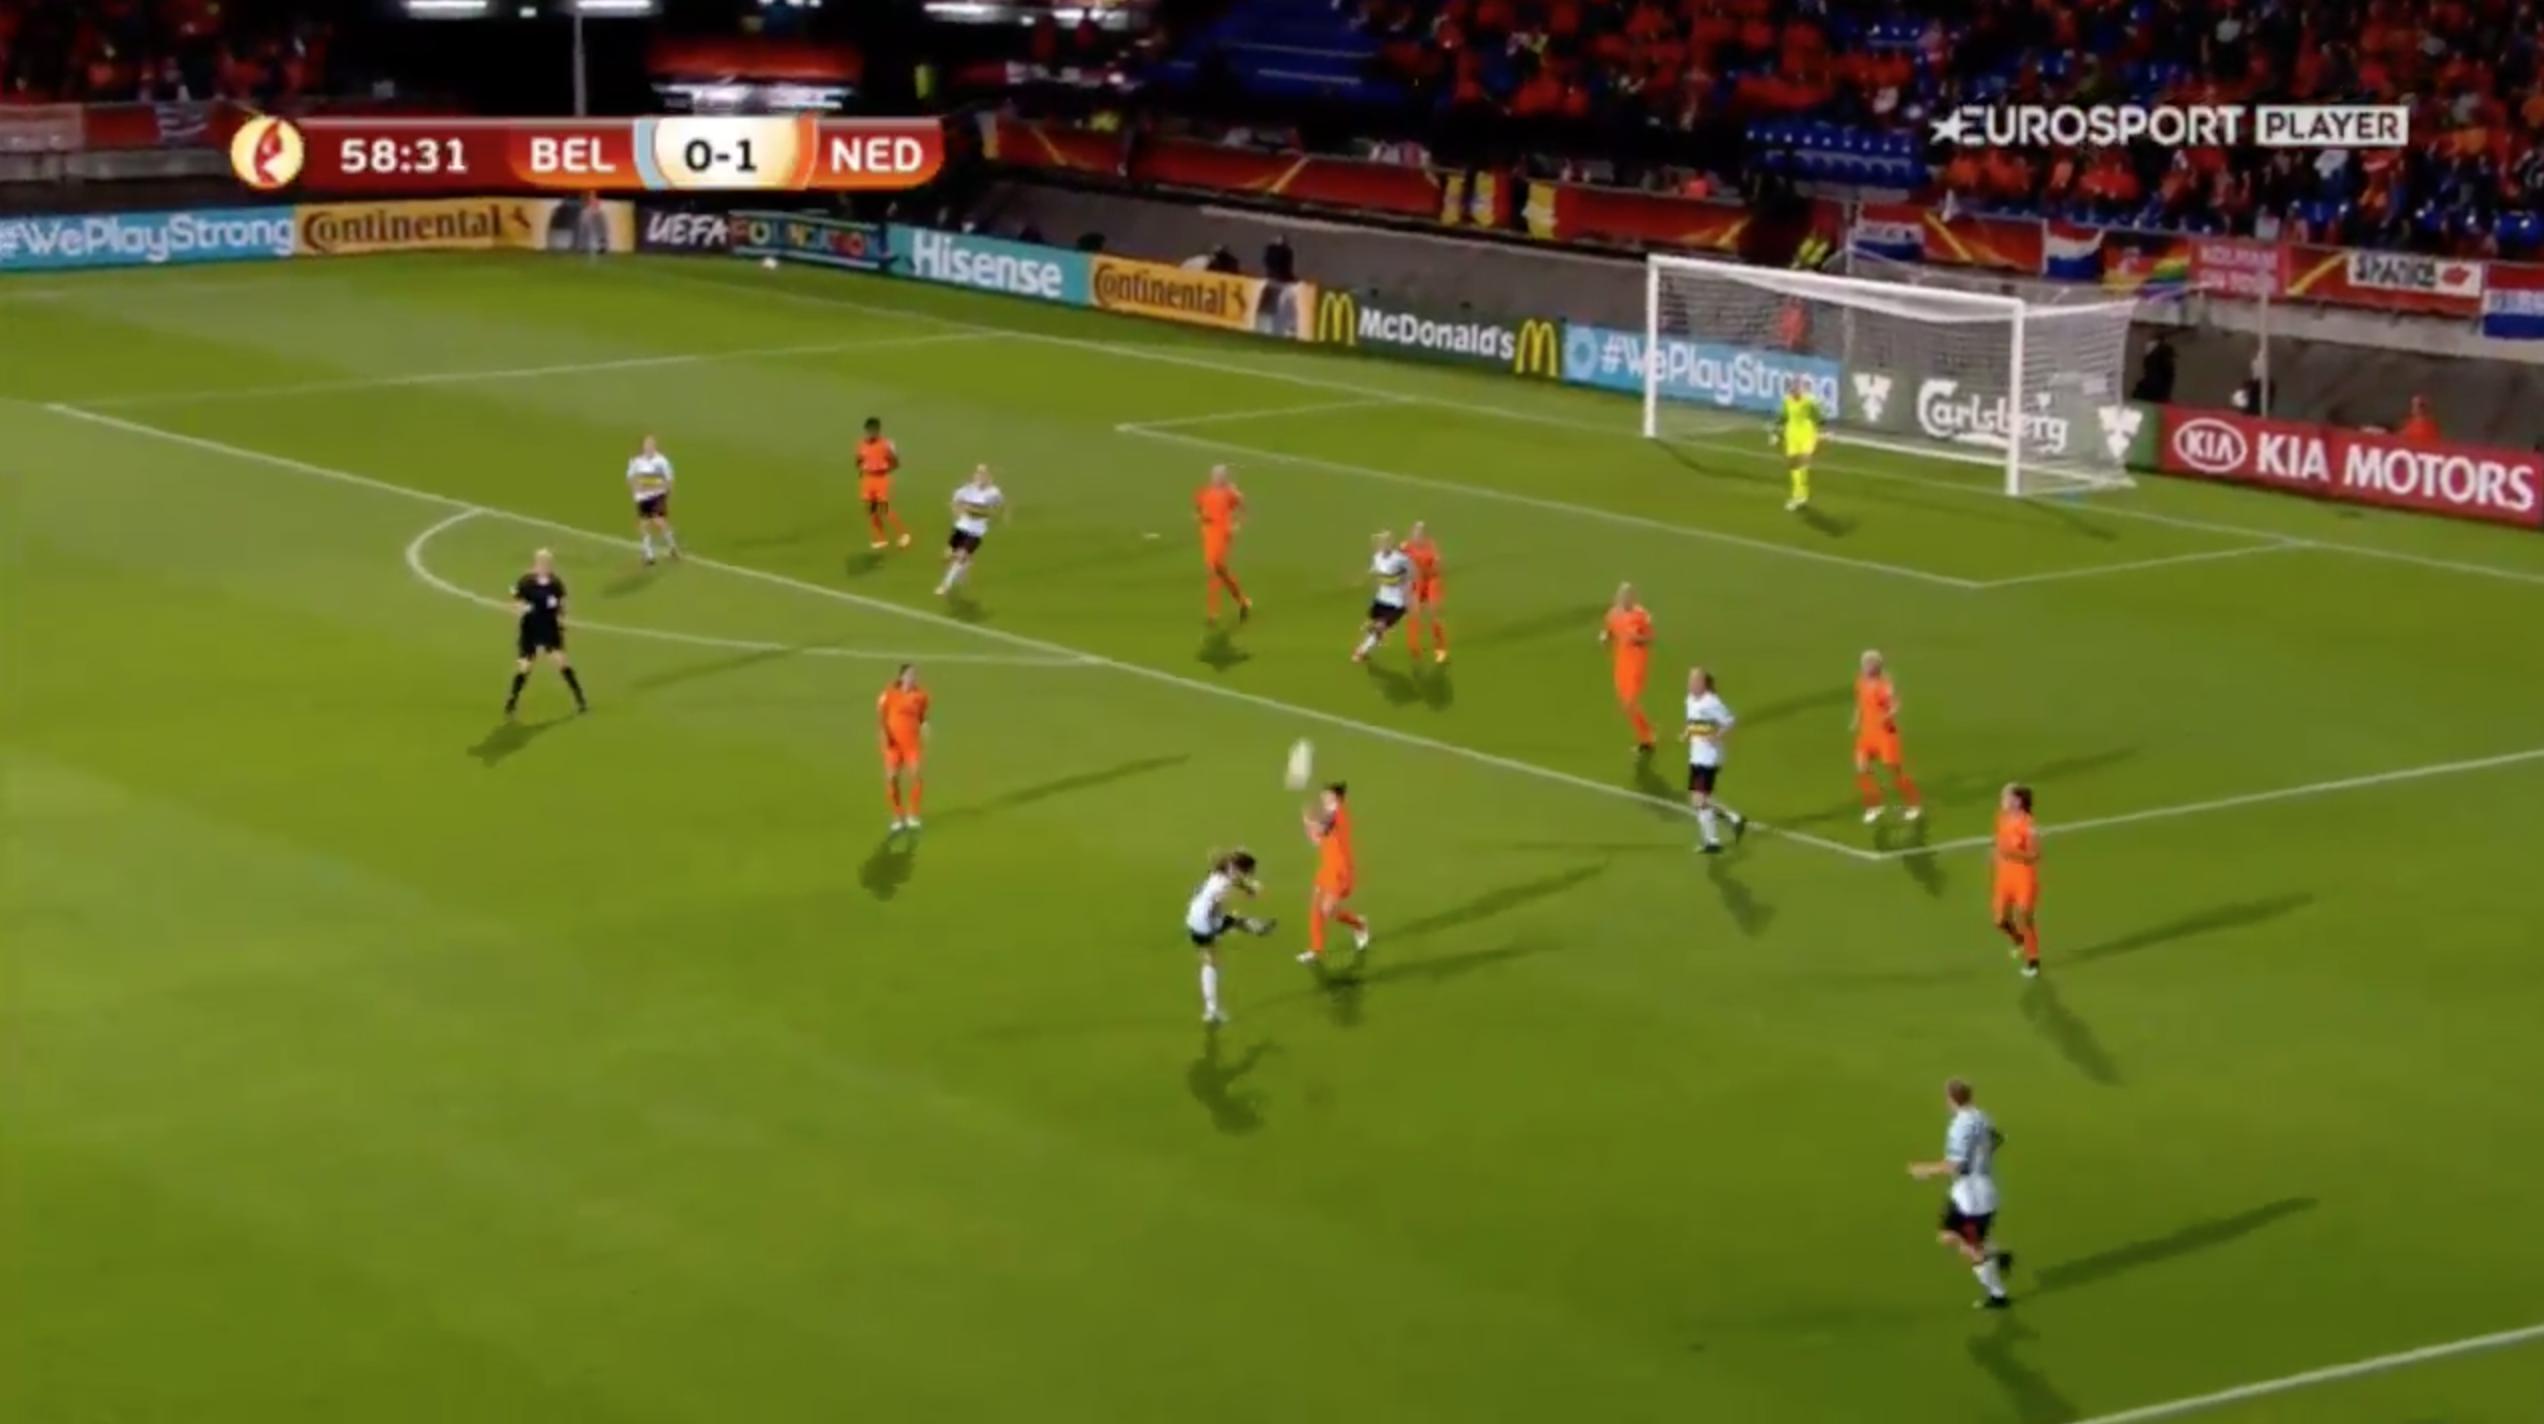 Video: Belgium's Tessa Wullaert Scores Jaw-Dropping Long-Range Goal